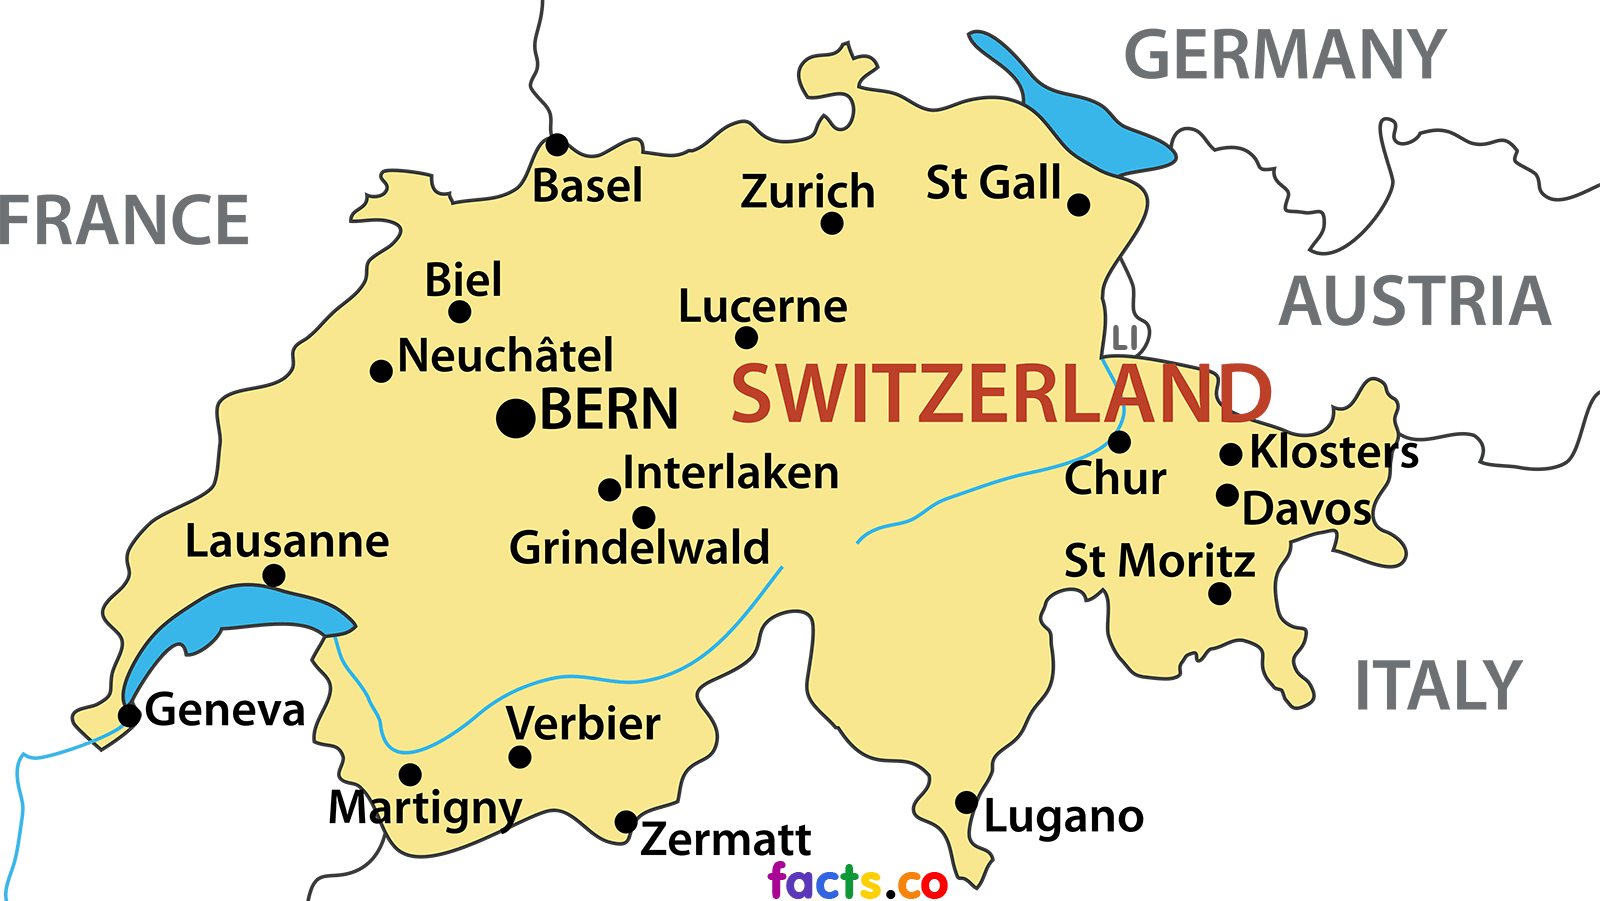 Pin By Jennifer Gold On Keshav Shah Period Switzerland - Switzerland map